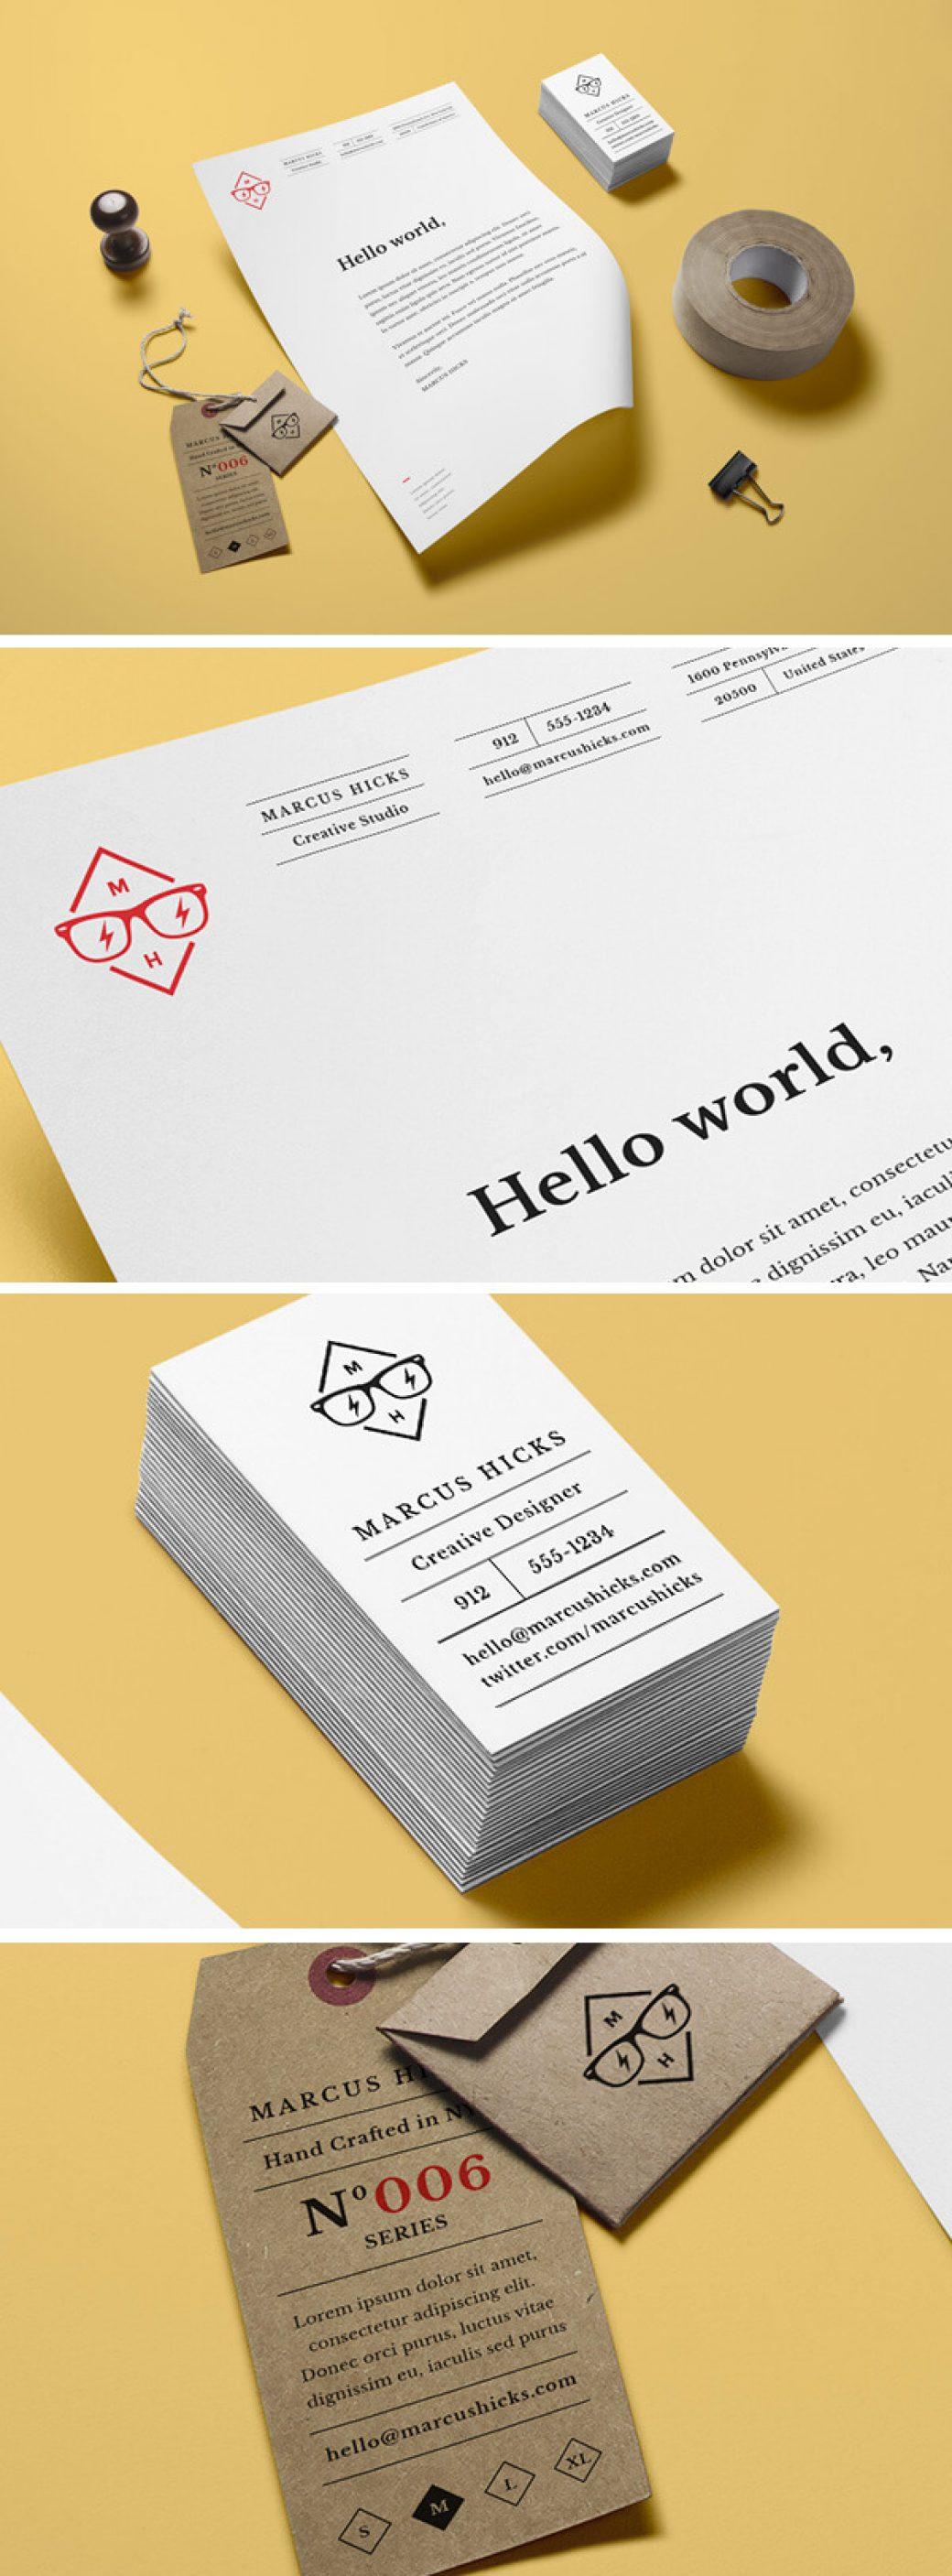 Branding-Identity-MockUp-Vol14-600